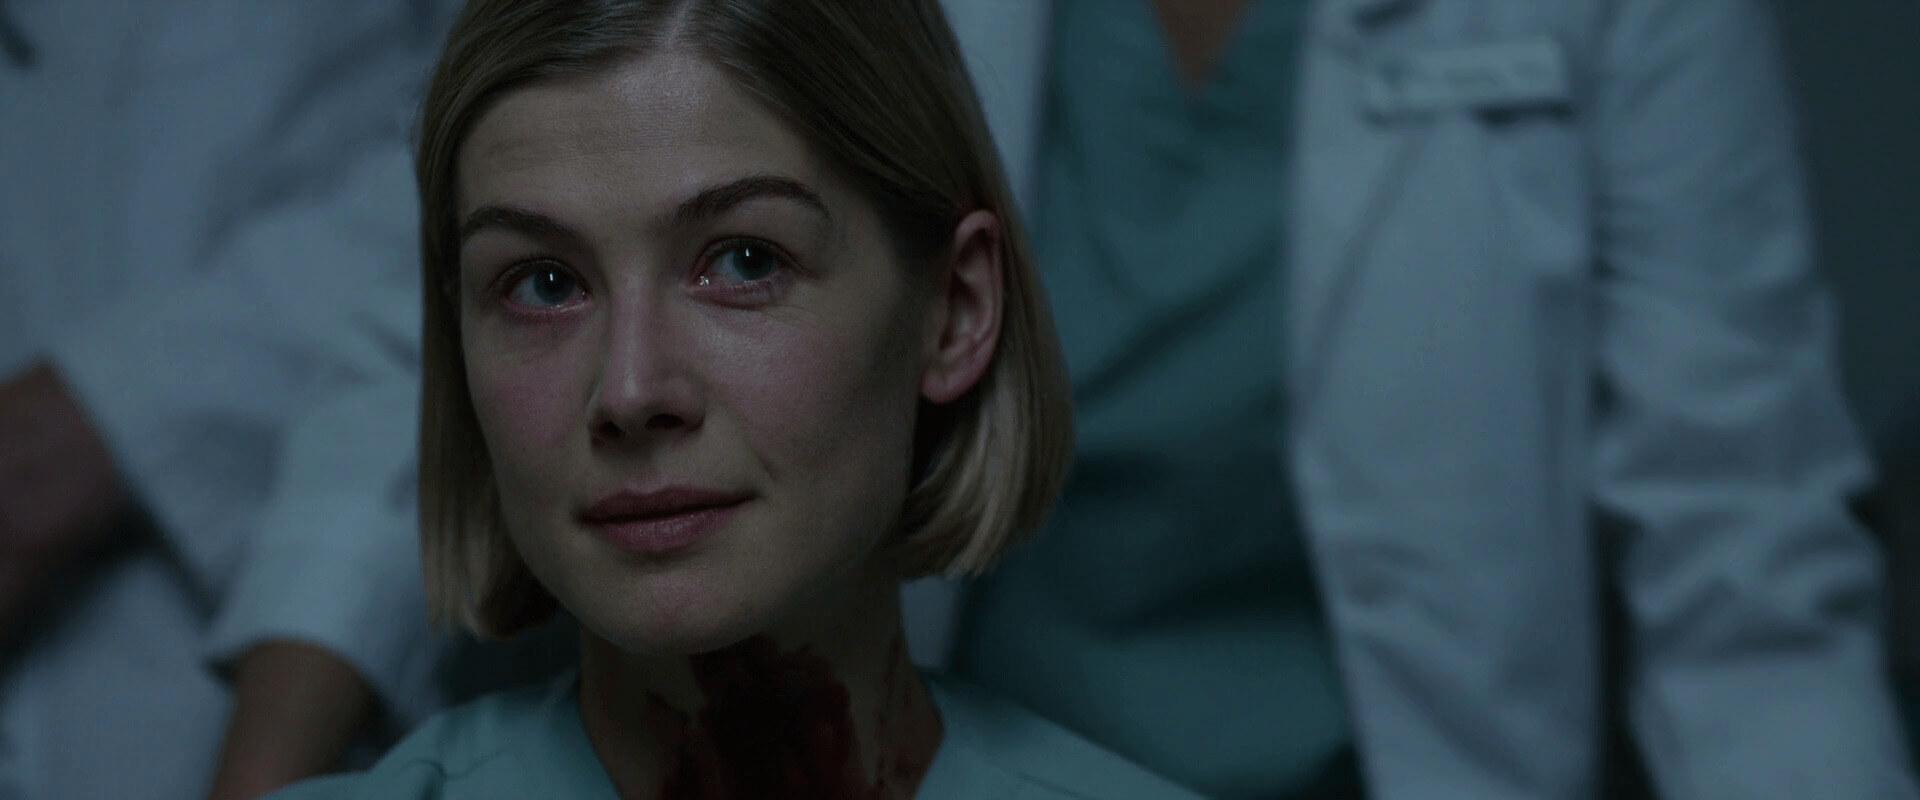 David Fincher Director Colors in Gone Girl